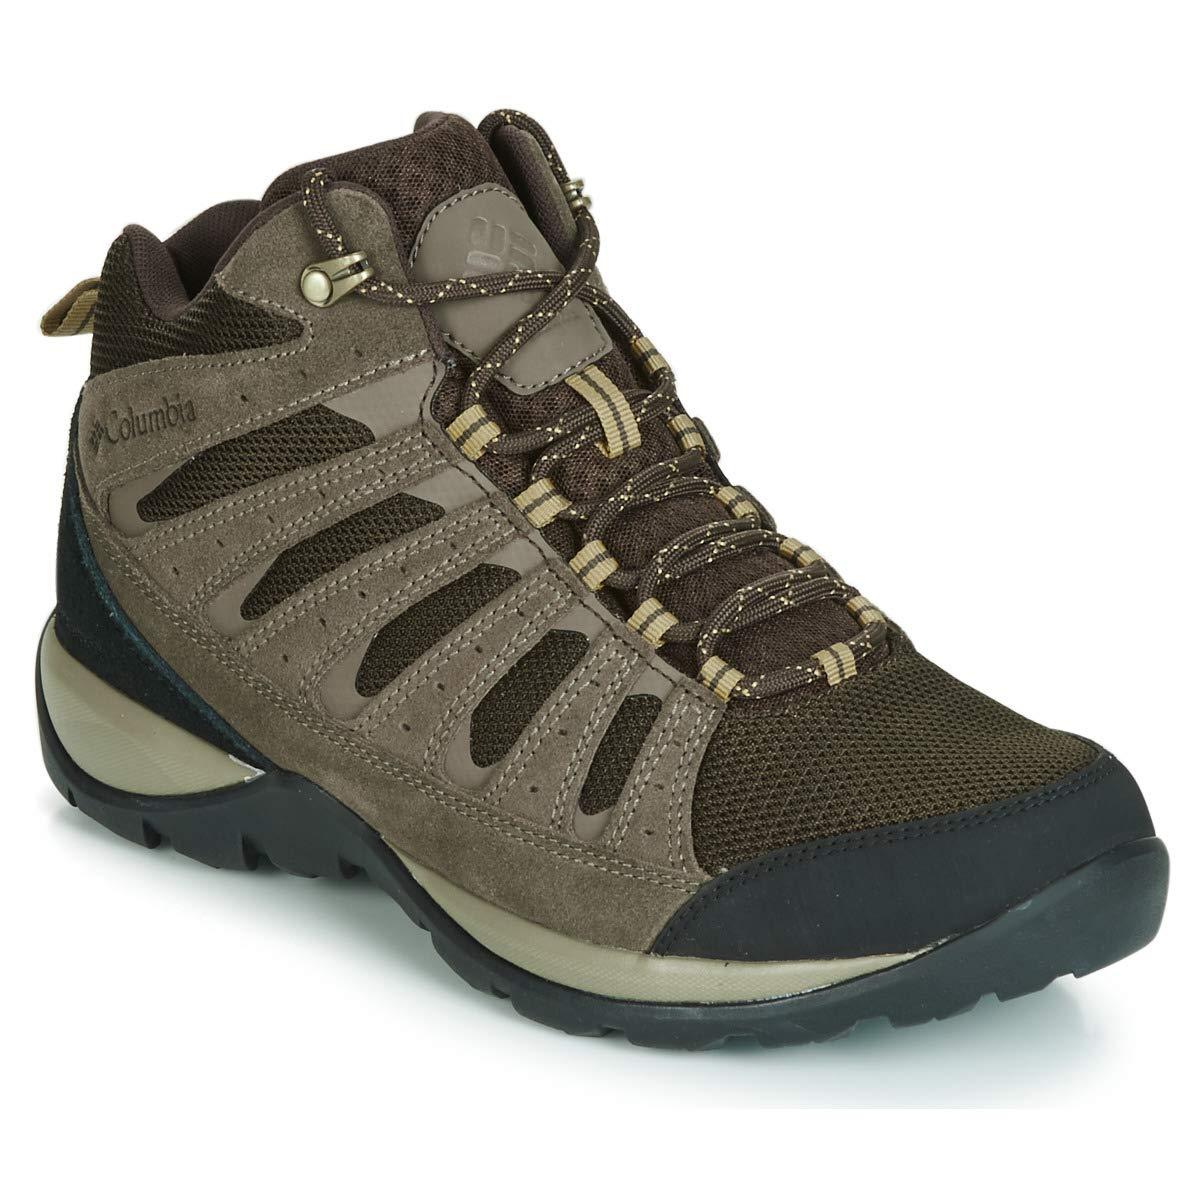 a62de44ce Amazon.com | Columbia Men's Redmond V2 Mid Waterproof Hiking Shoe ...